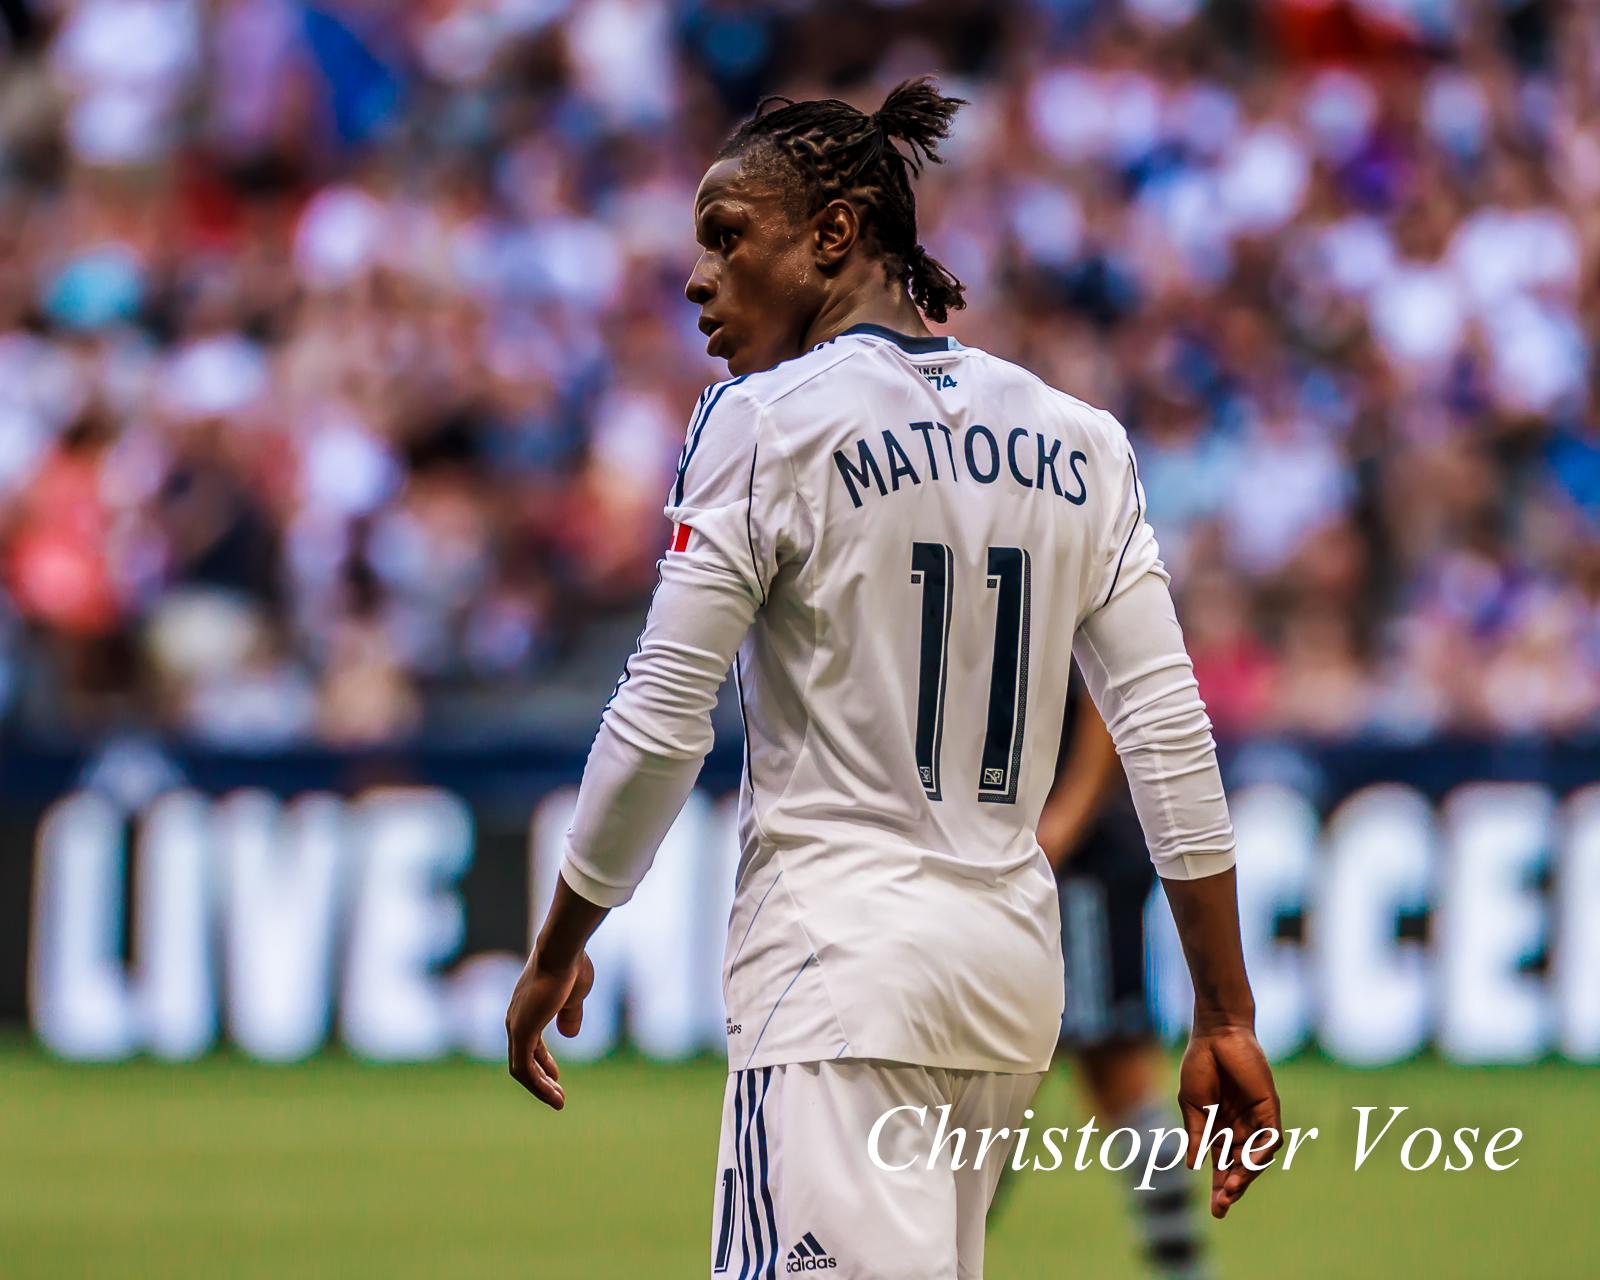 2014-08-10 Darren Mattocks Goal Celebration 2.jpg